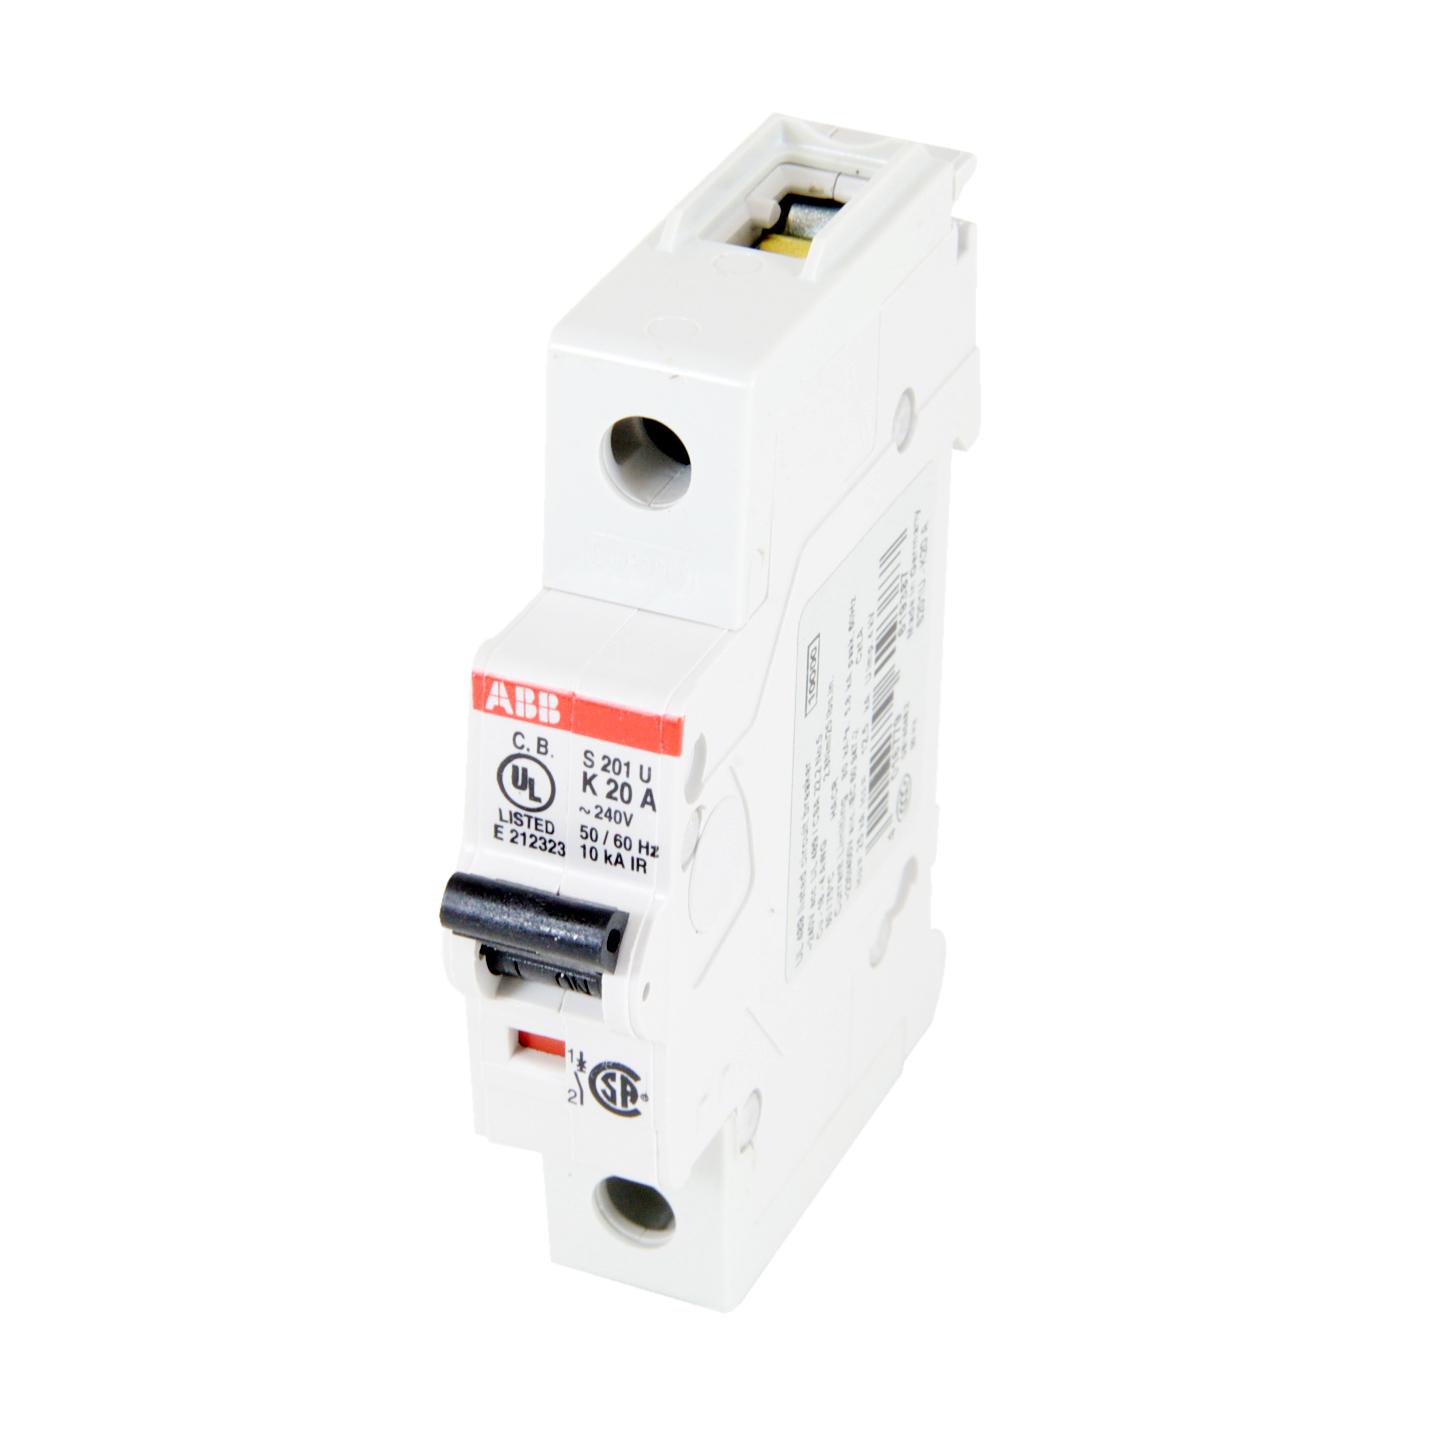 Thomas & Betts S201U-K20 1-Pole 20 Amp 240 Volt Bcpd Miniature Circuit Breaker